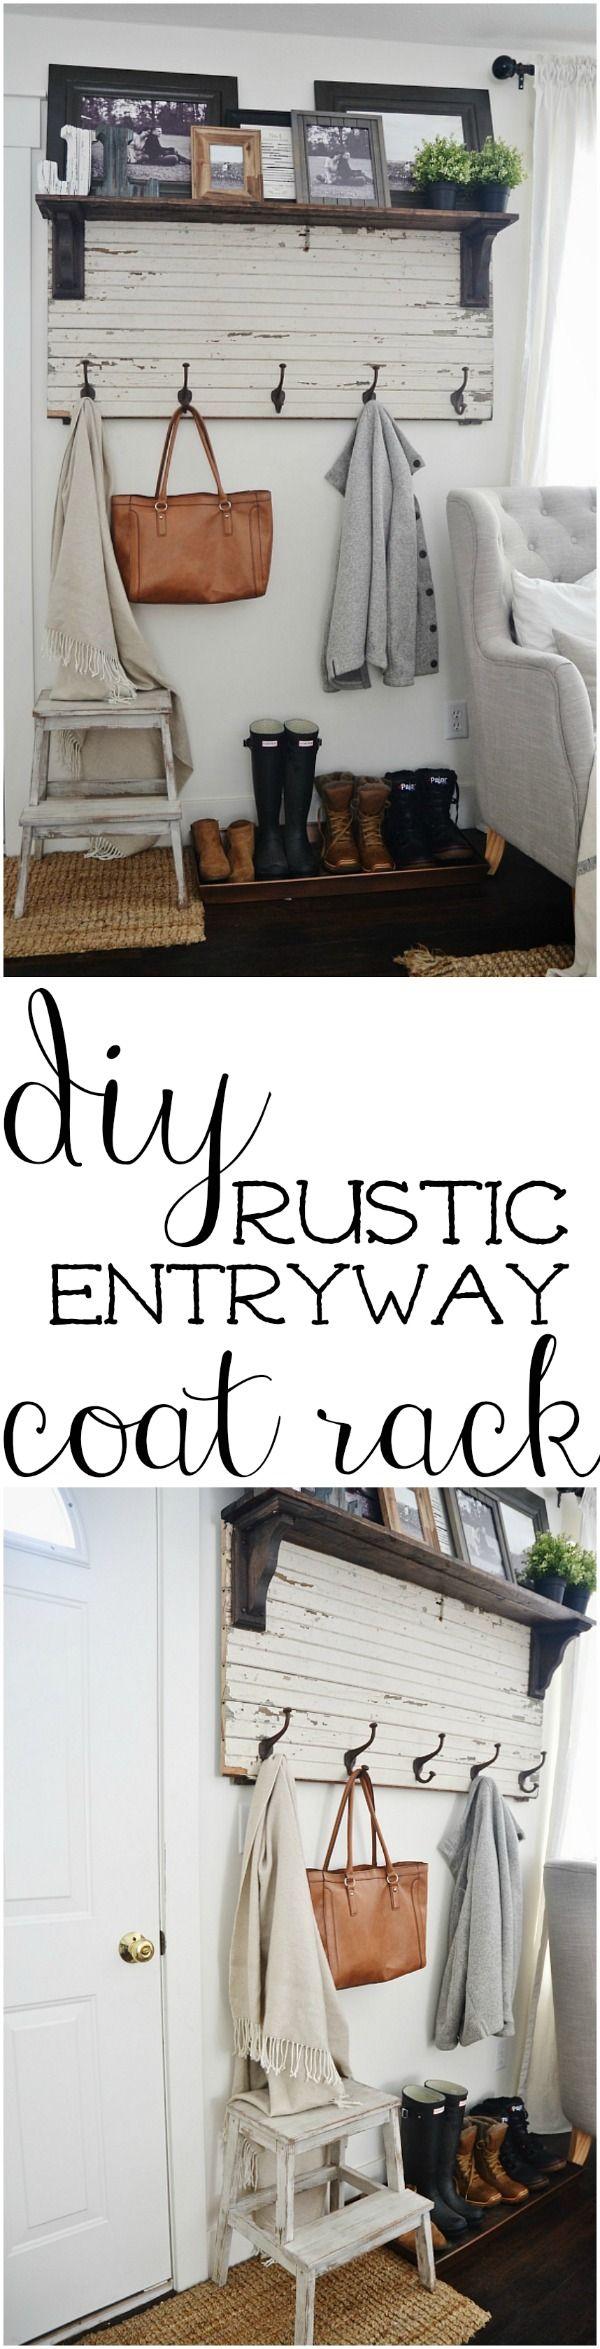 DIY Rustic Entryway Coat Rack